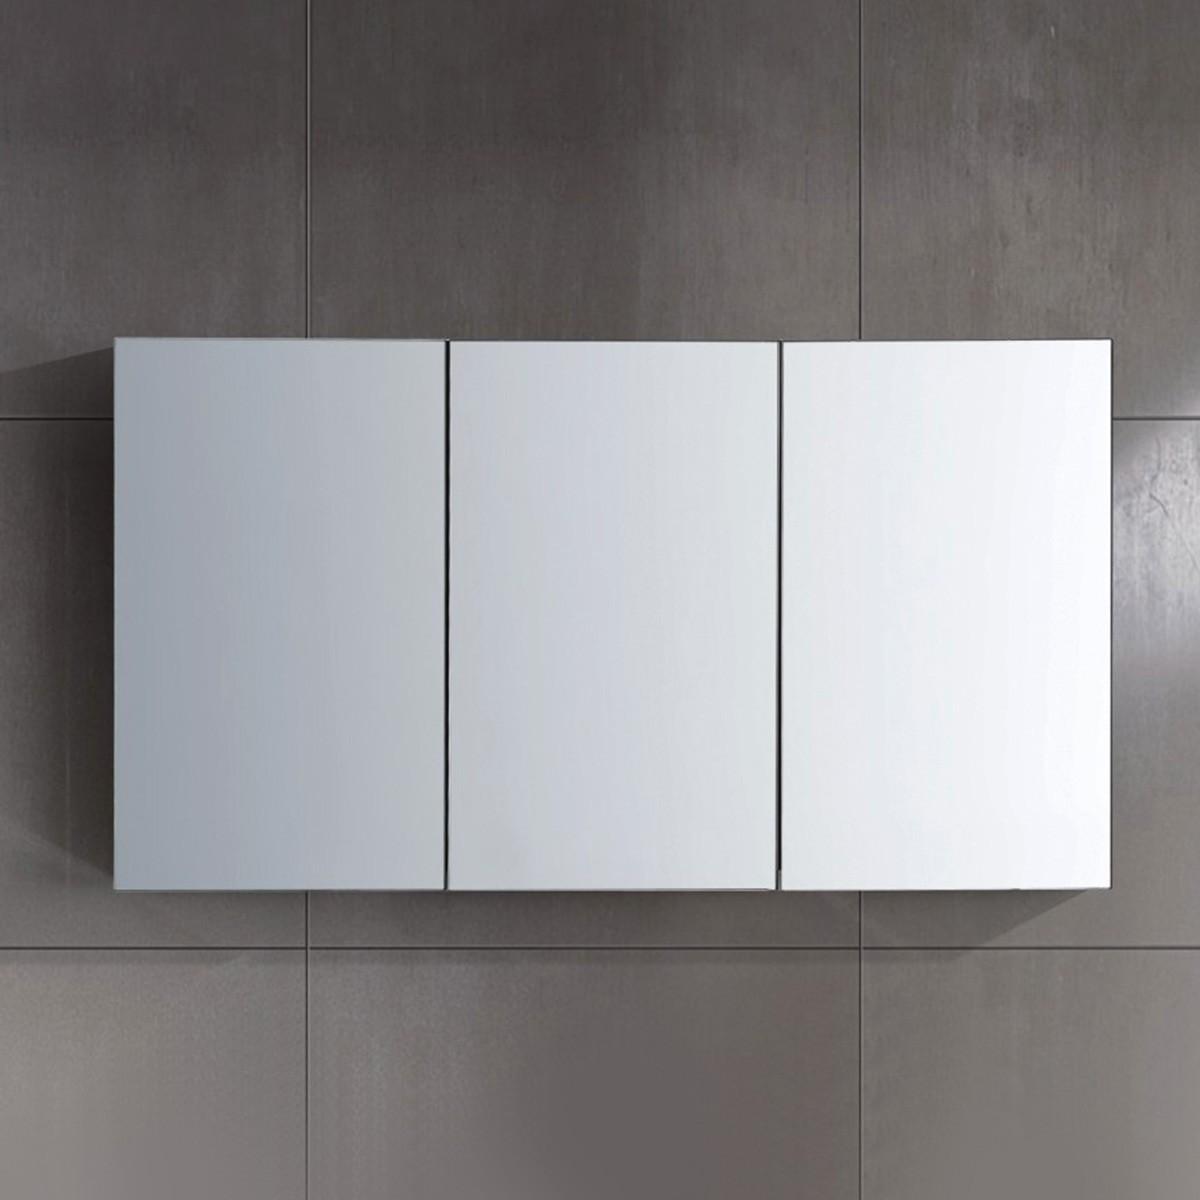 48 x 26 In. Mirror Cabinet with 3 Mirror Doors (JD054-M)